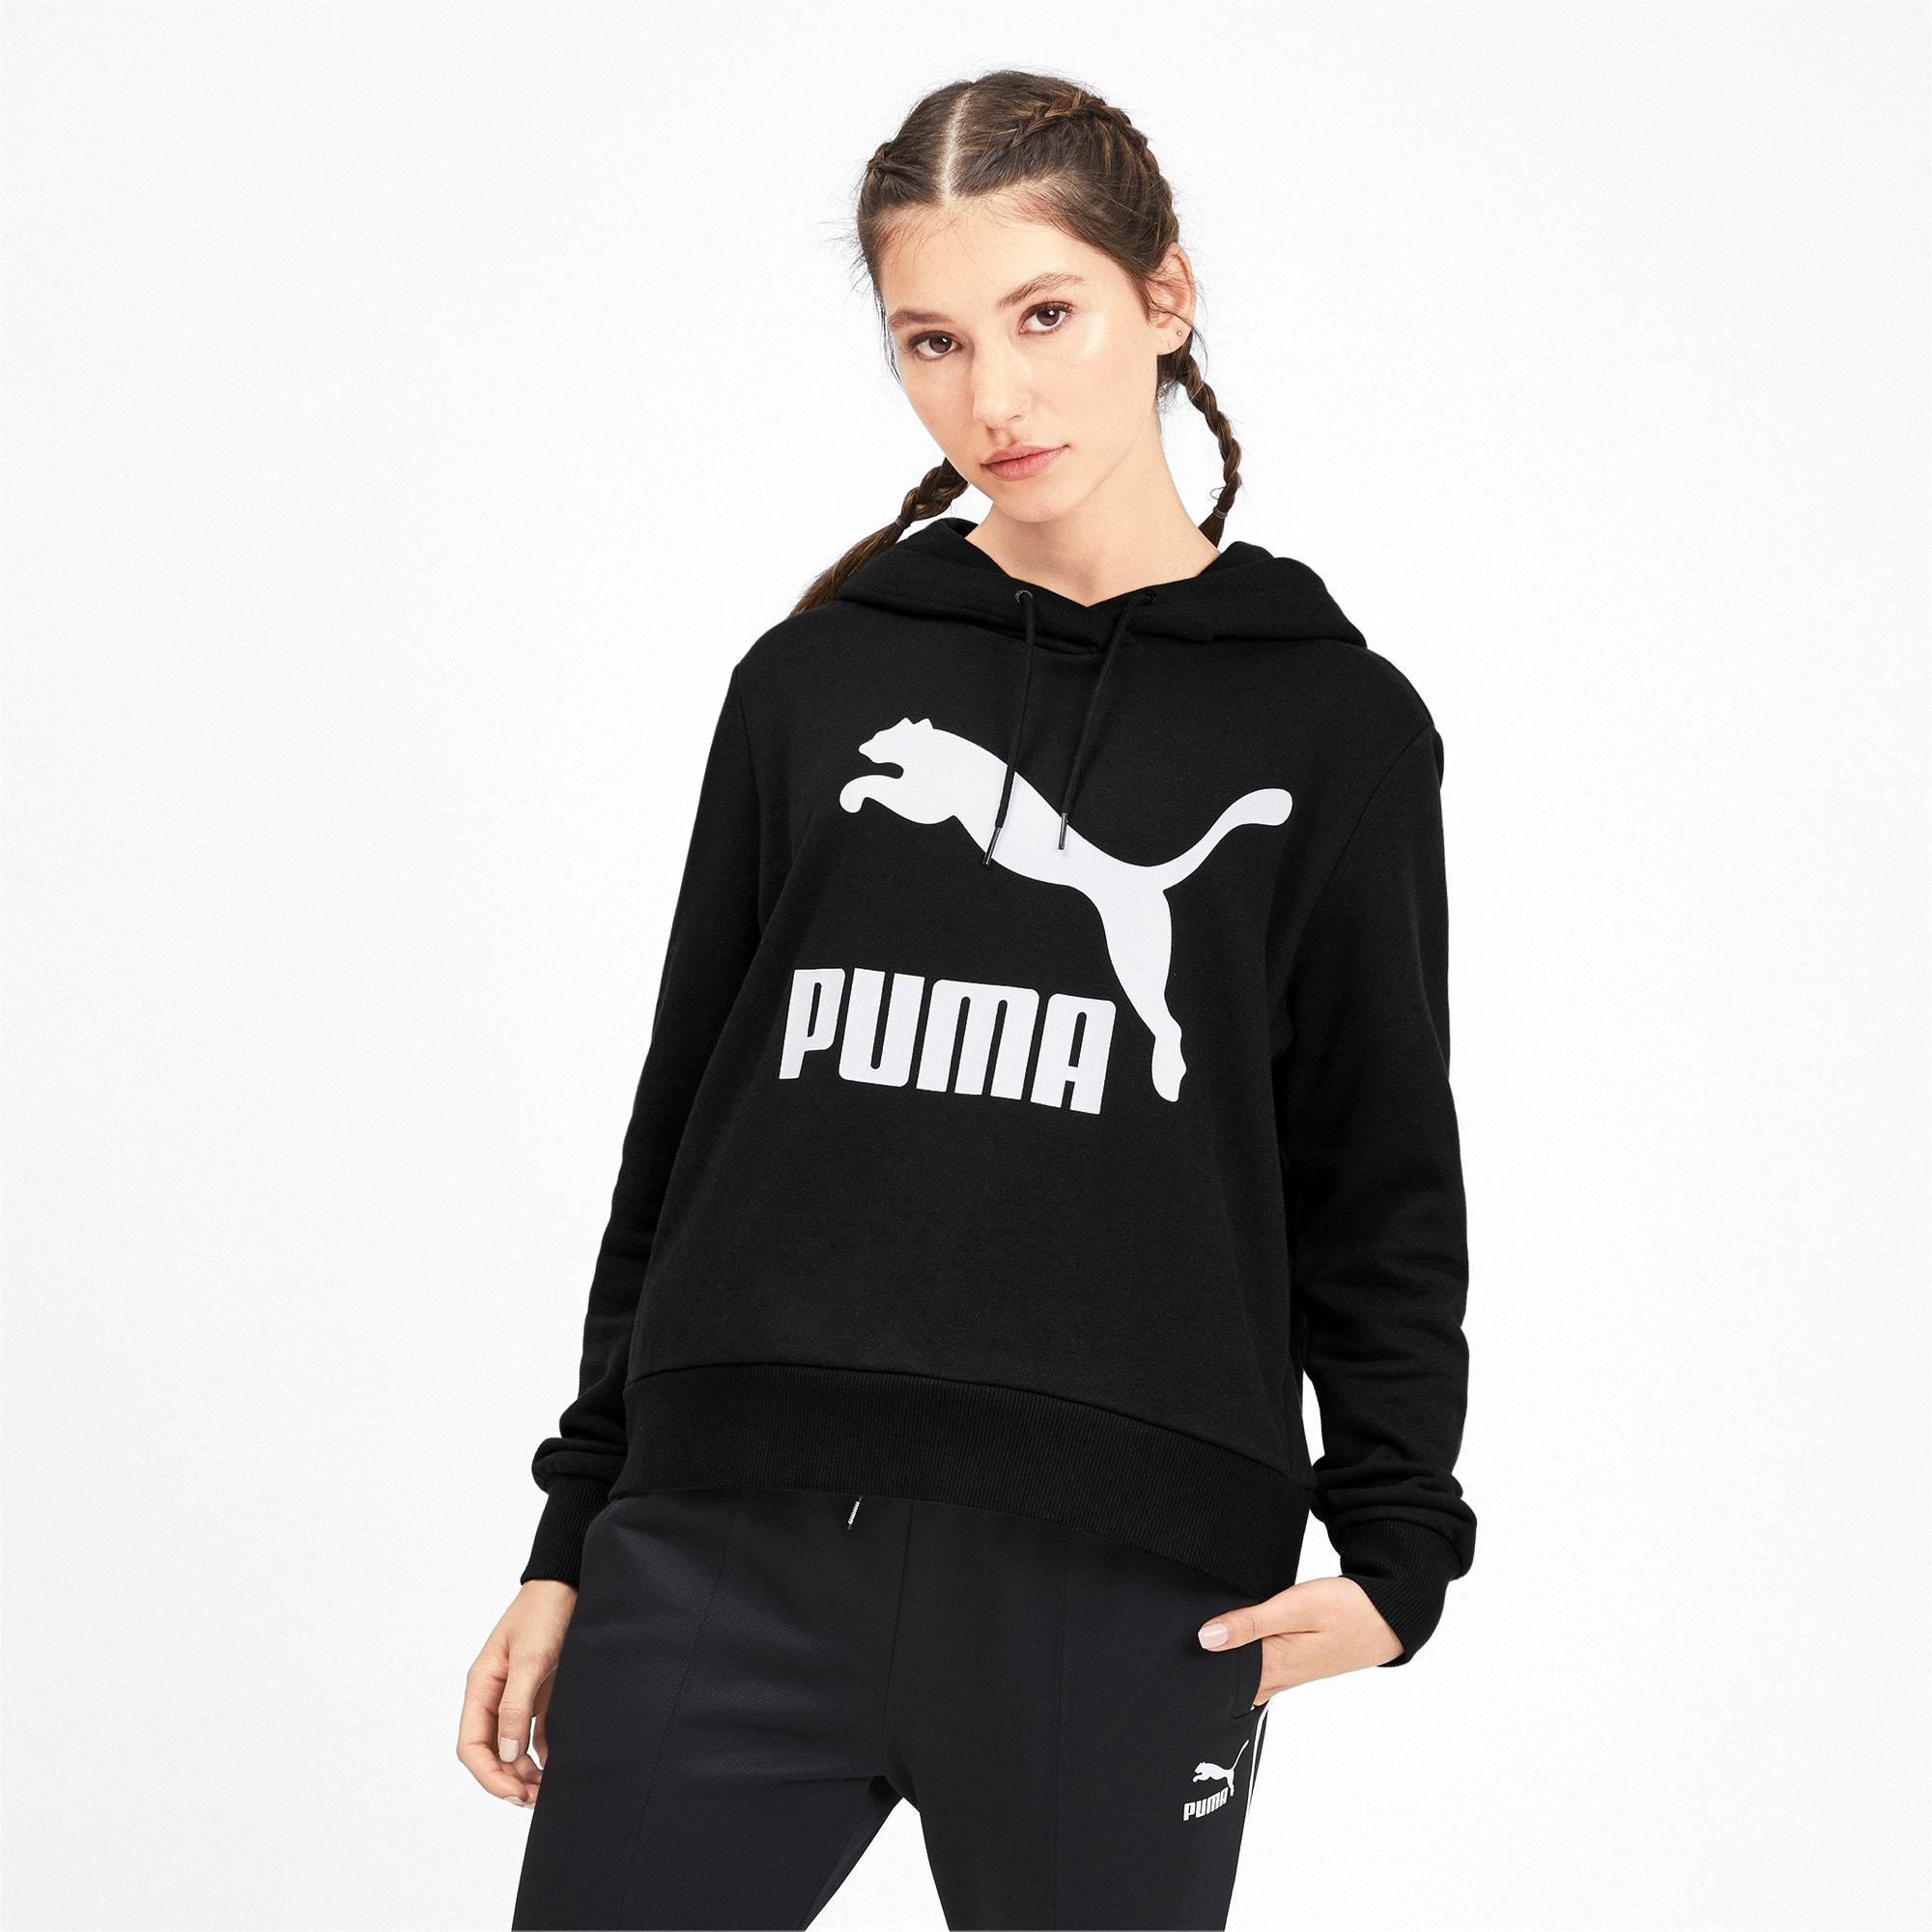 Thumbnail 2 of Classics Women's Logo Hoodie, Puma Black, medium